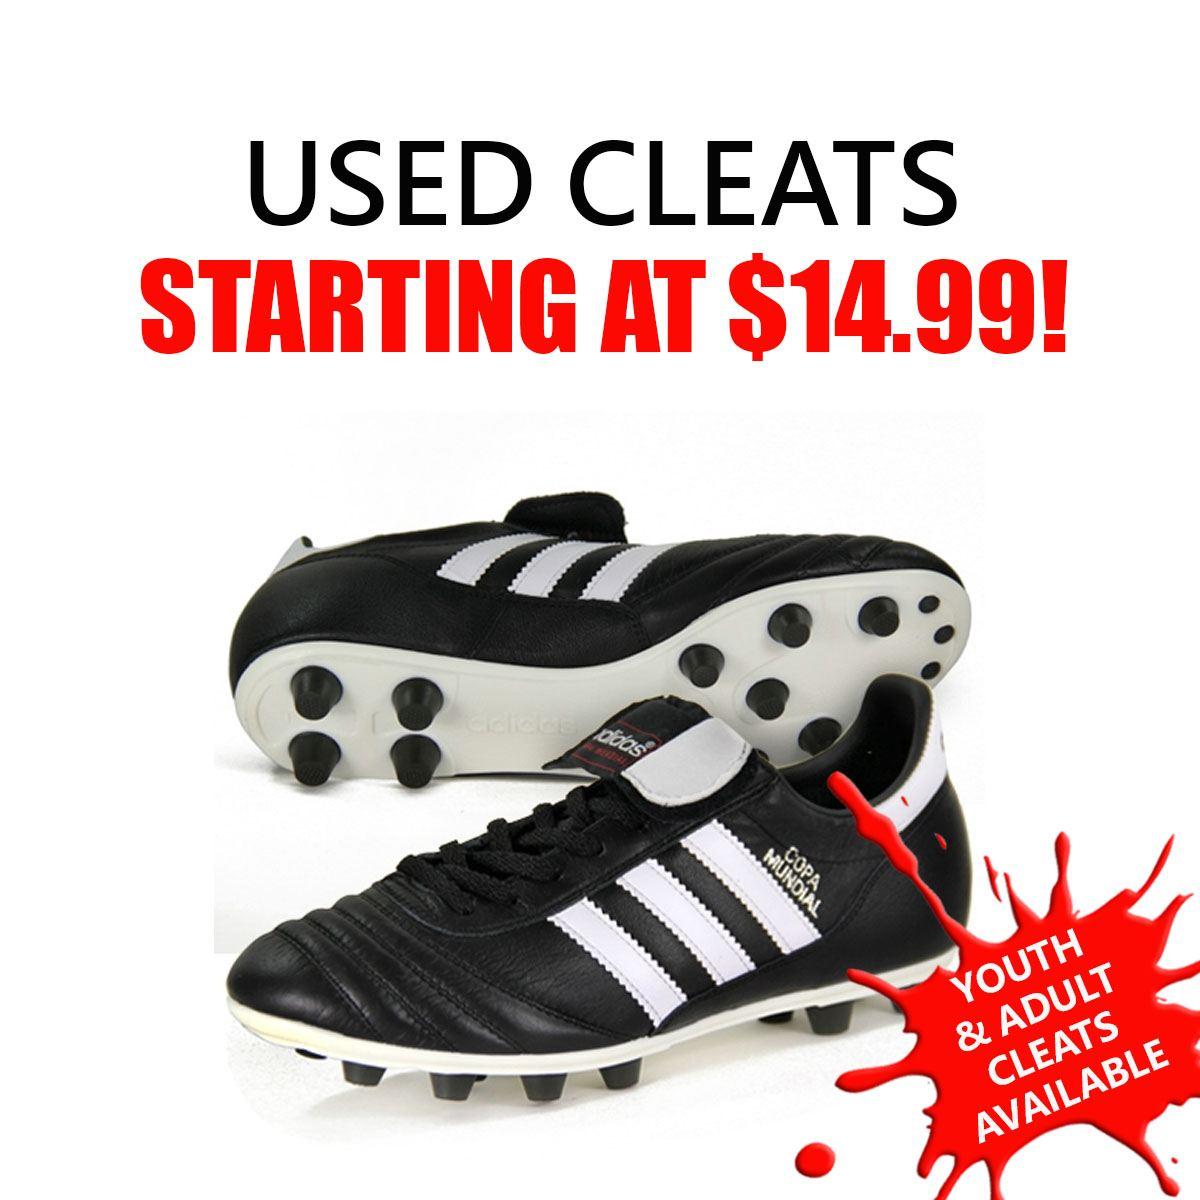 New \u0026 Used Soccer Equipment Clearance